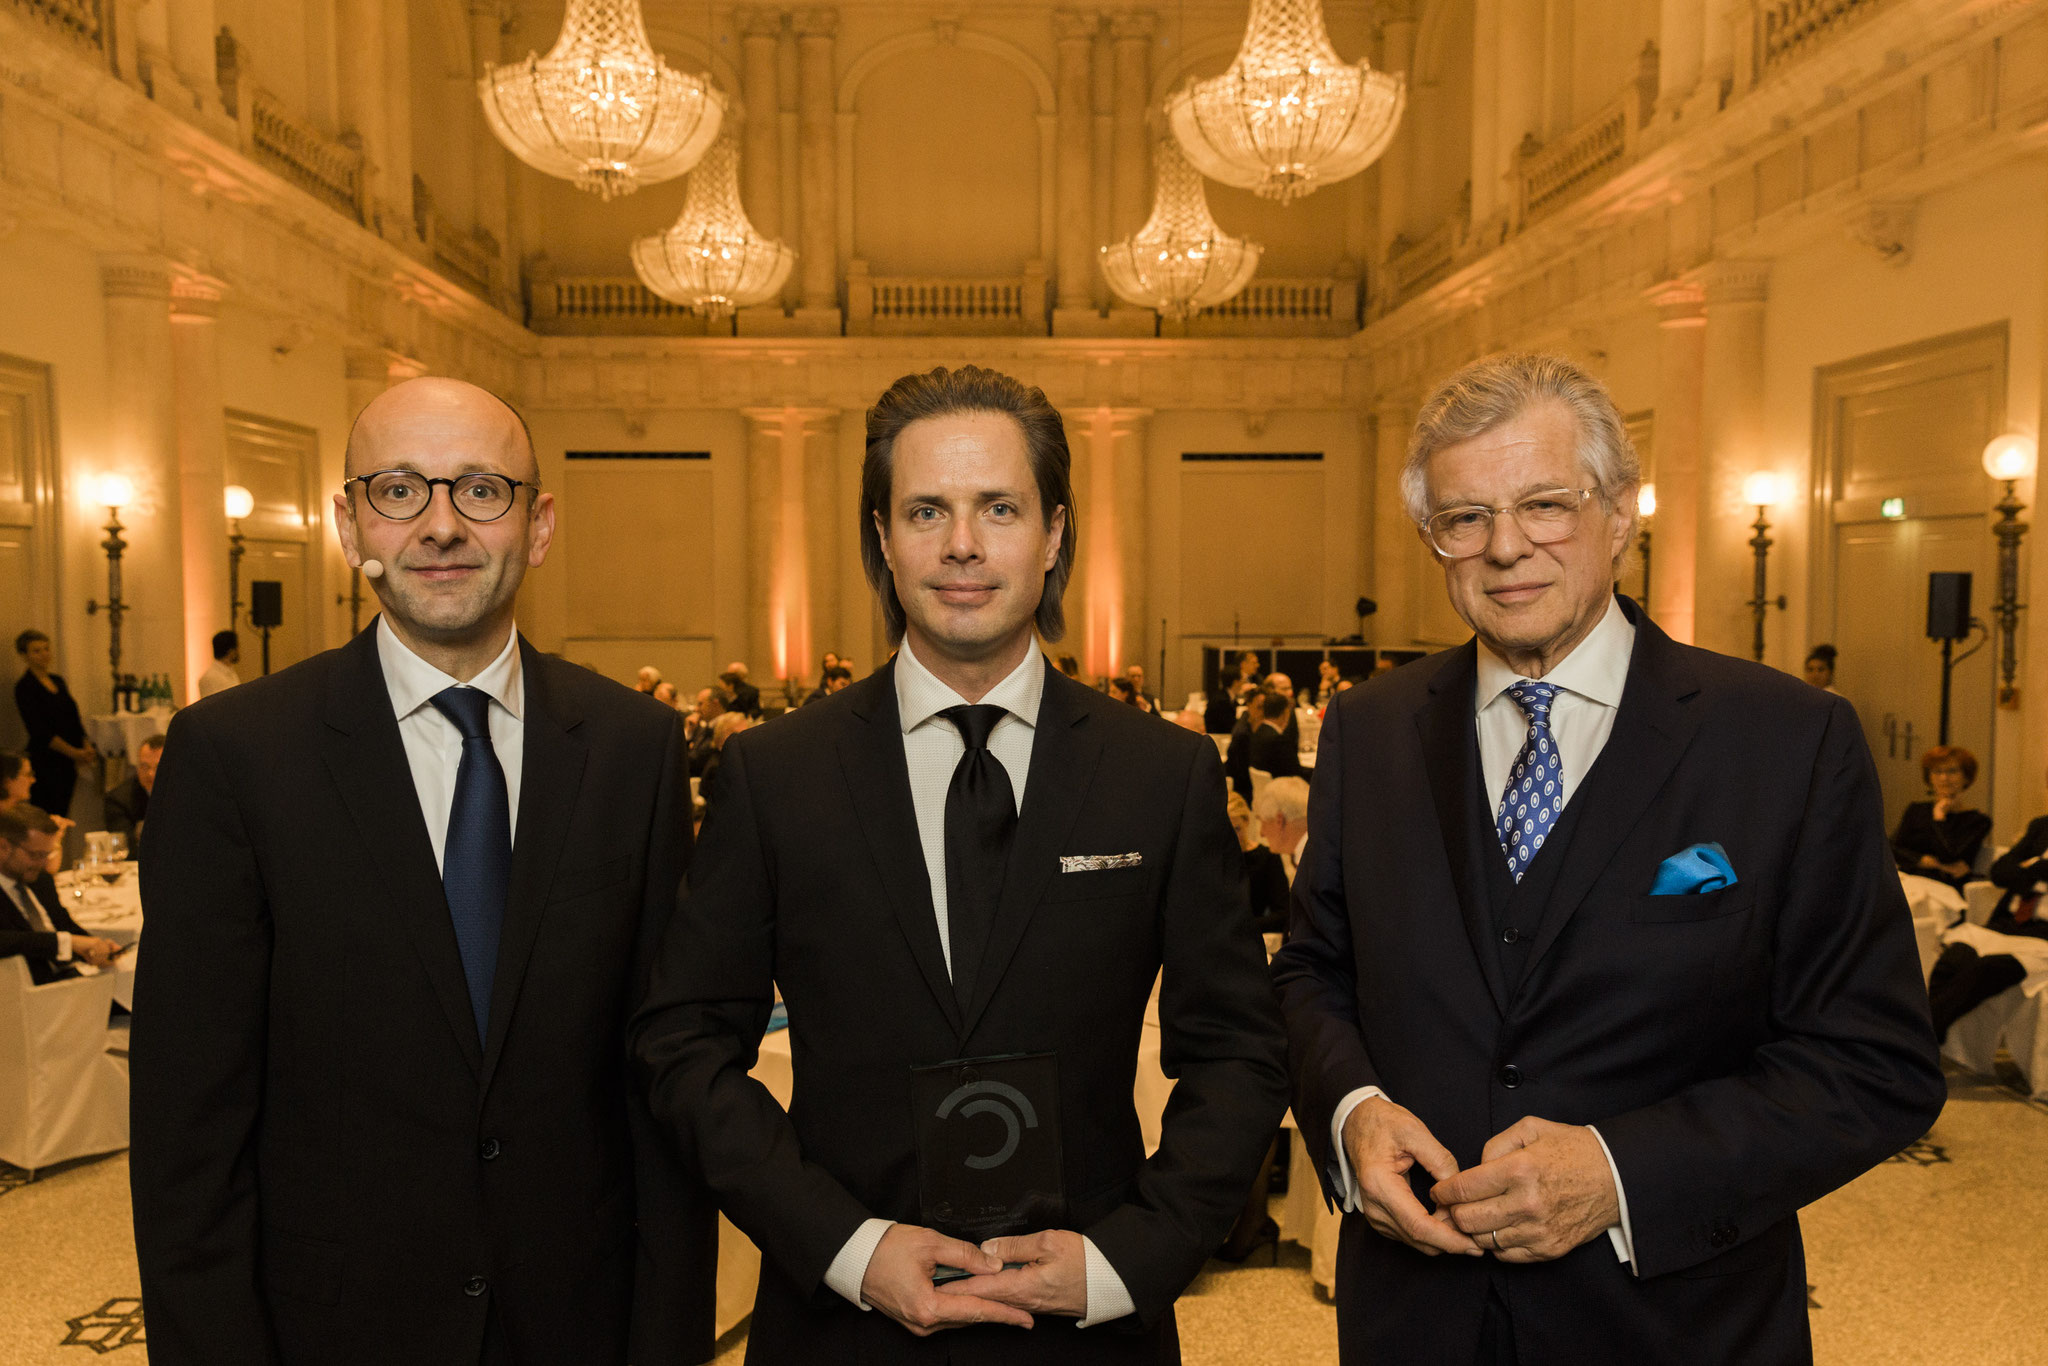 Lucas Flöther, Tilman Rauhut, second prize Research Award, Bruno Kübler © 2018 Sven Döring